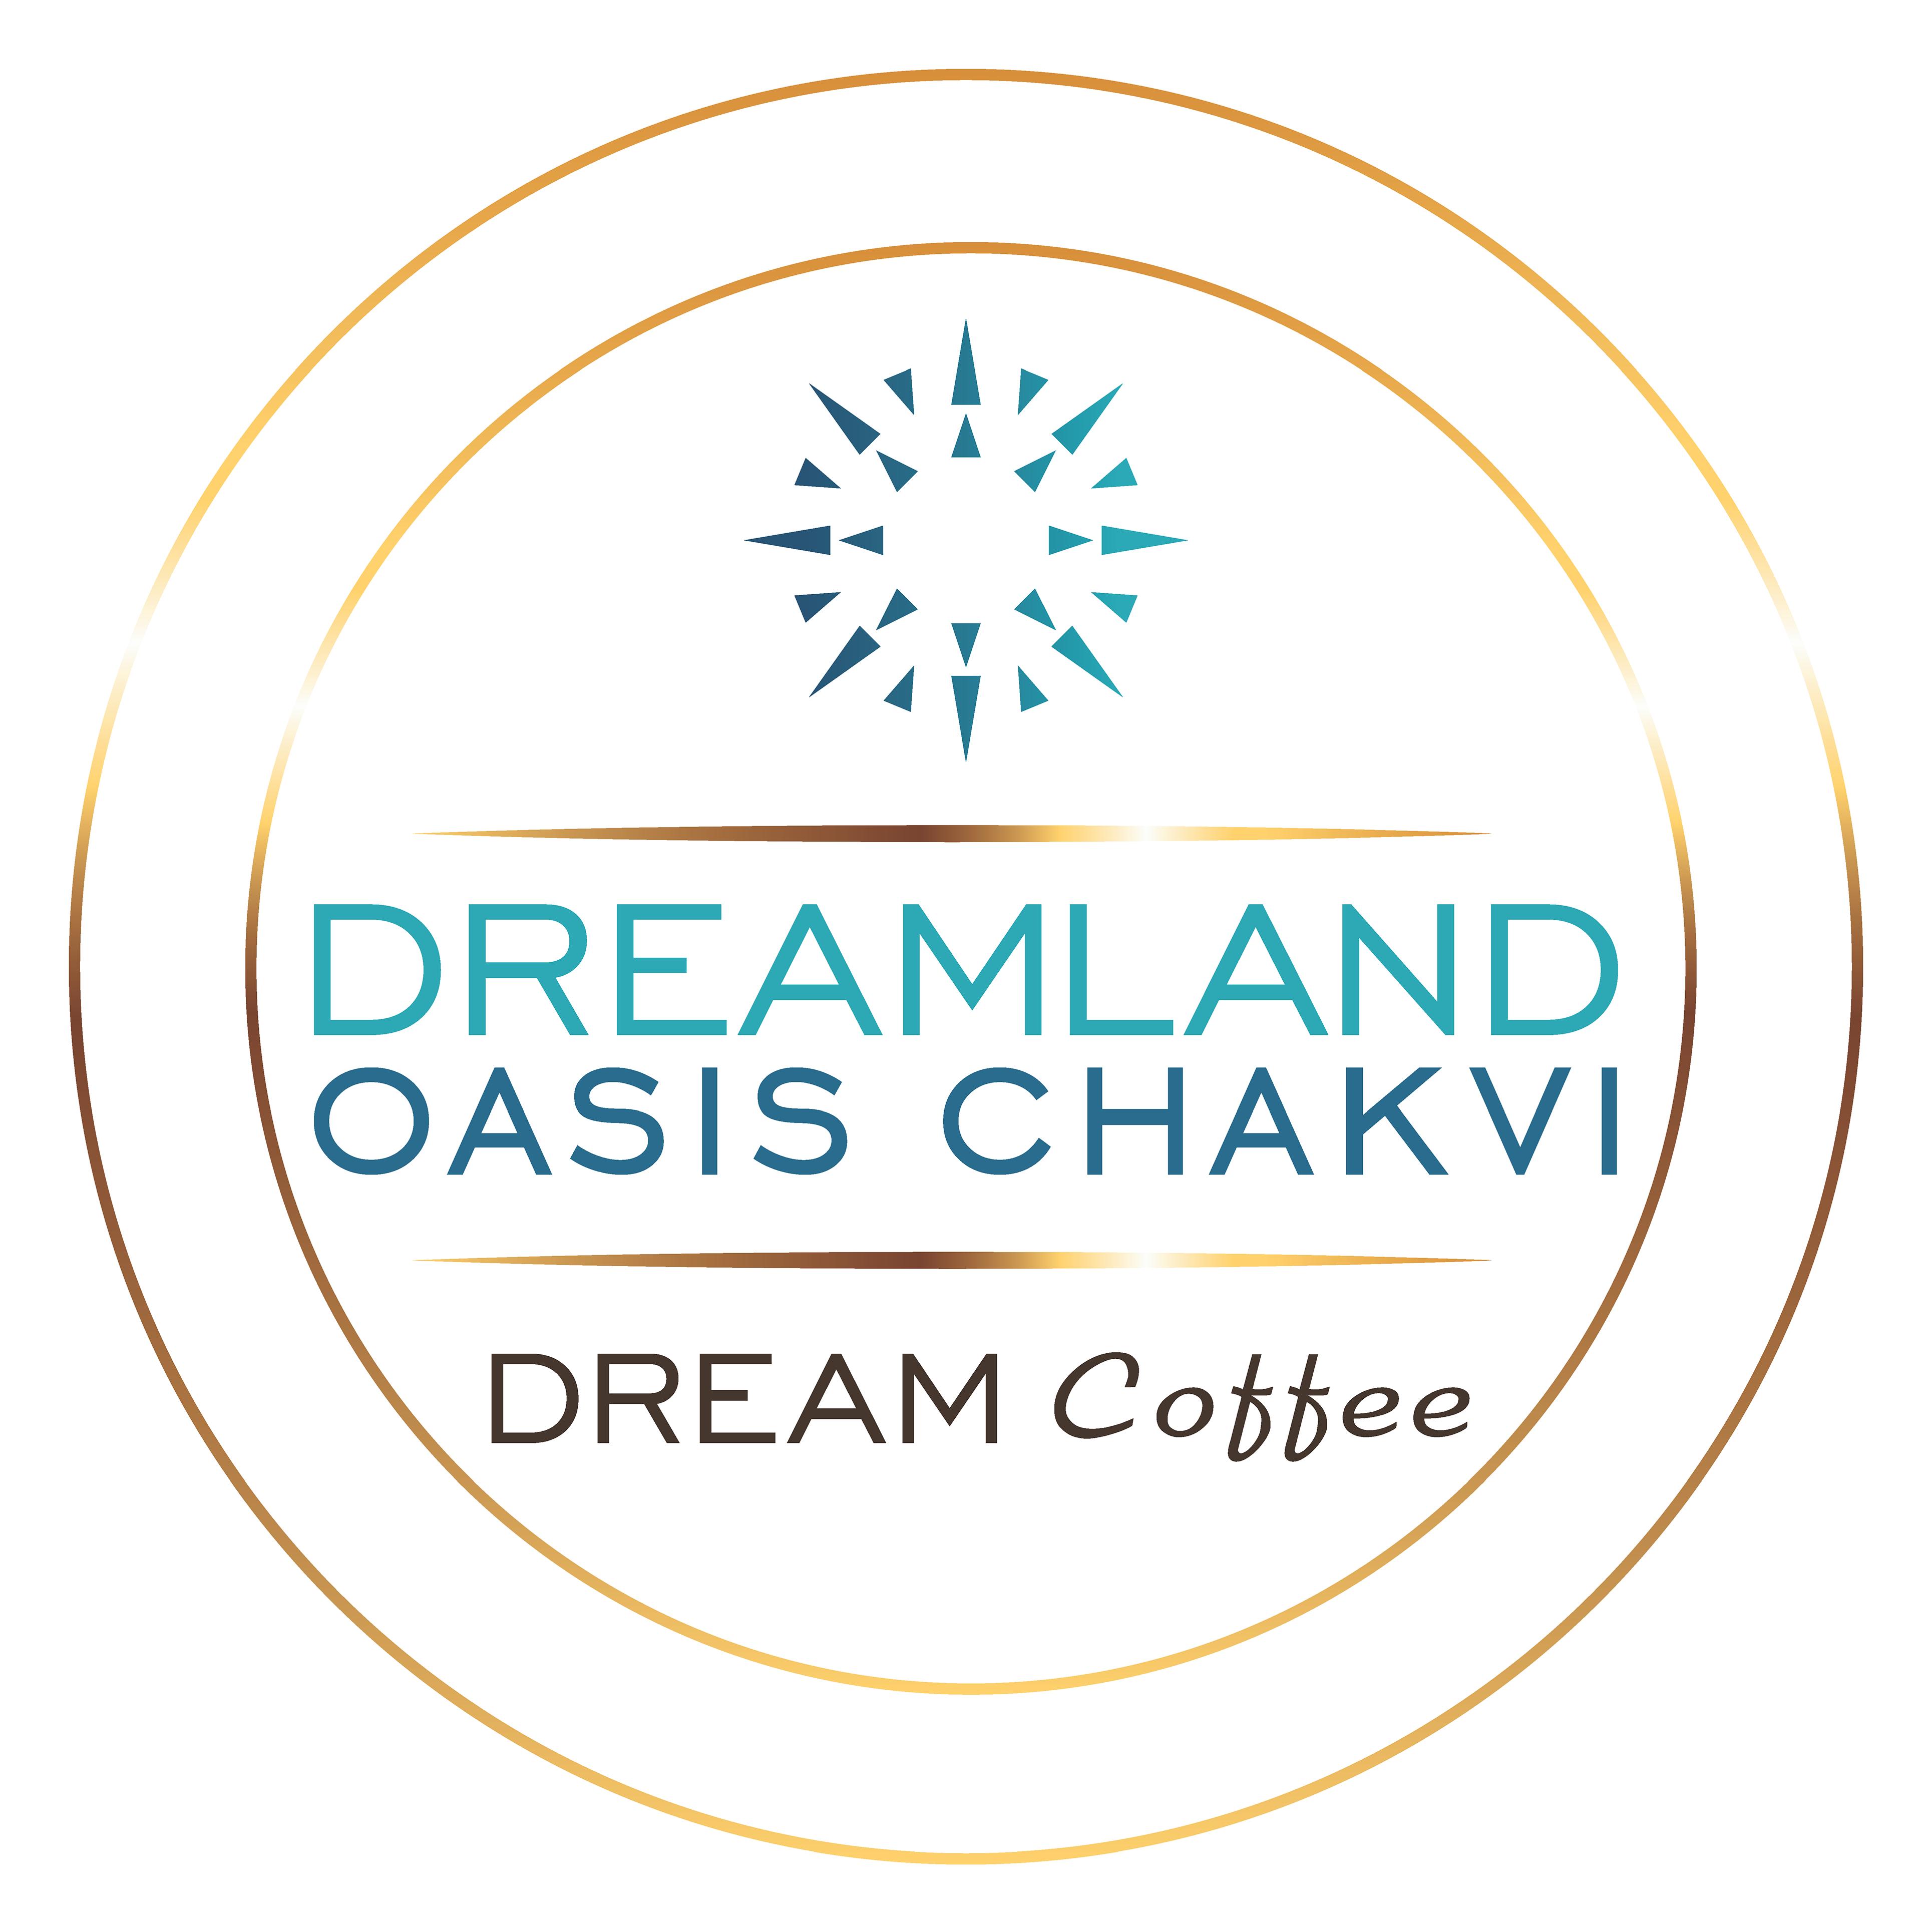 Dreamland Oasis